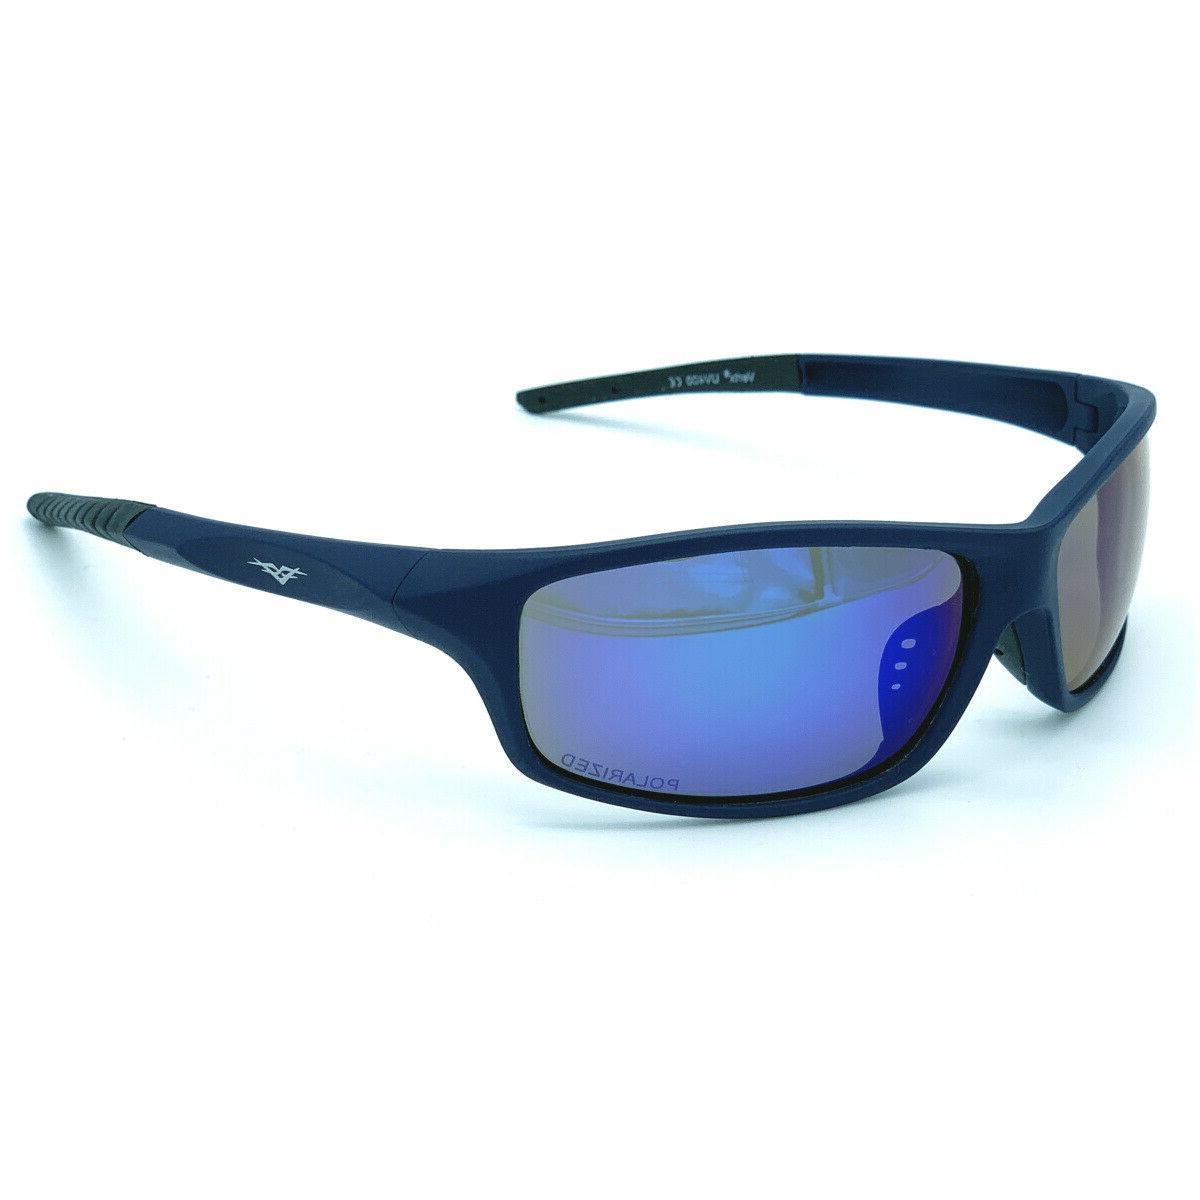 NEW Men Sport Driving Eyewear Glasses